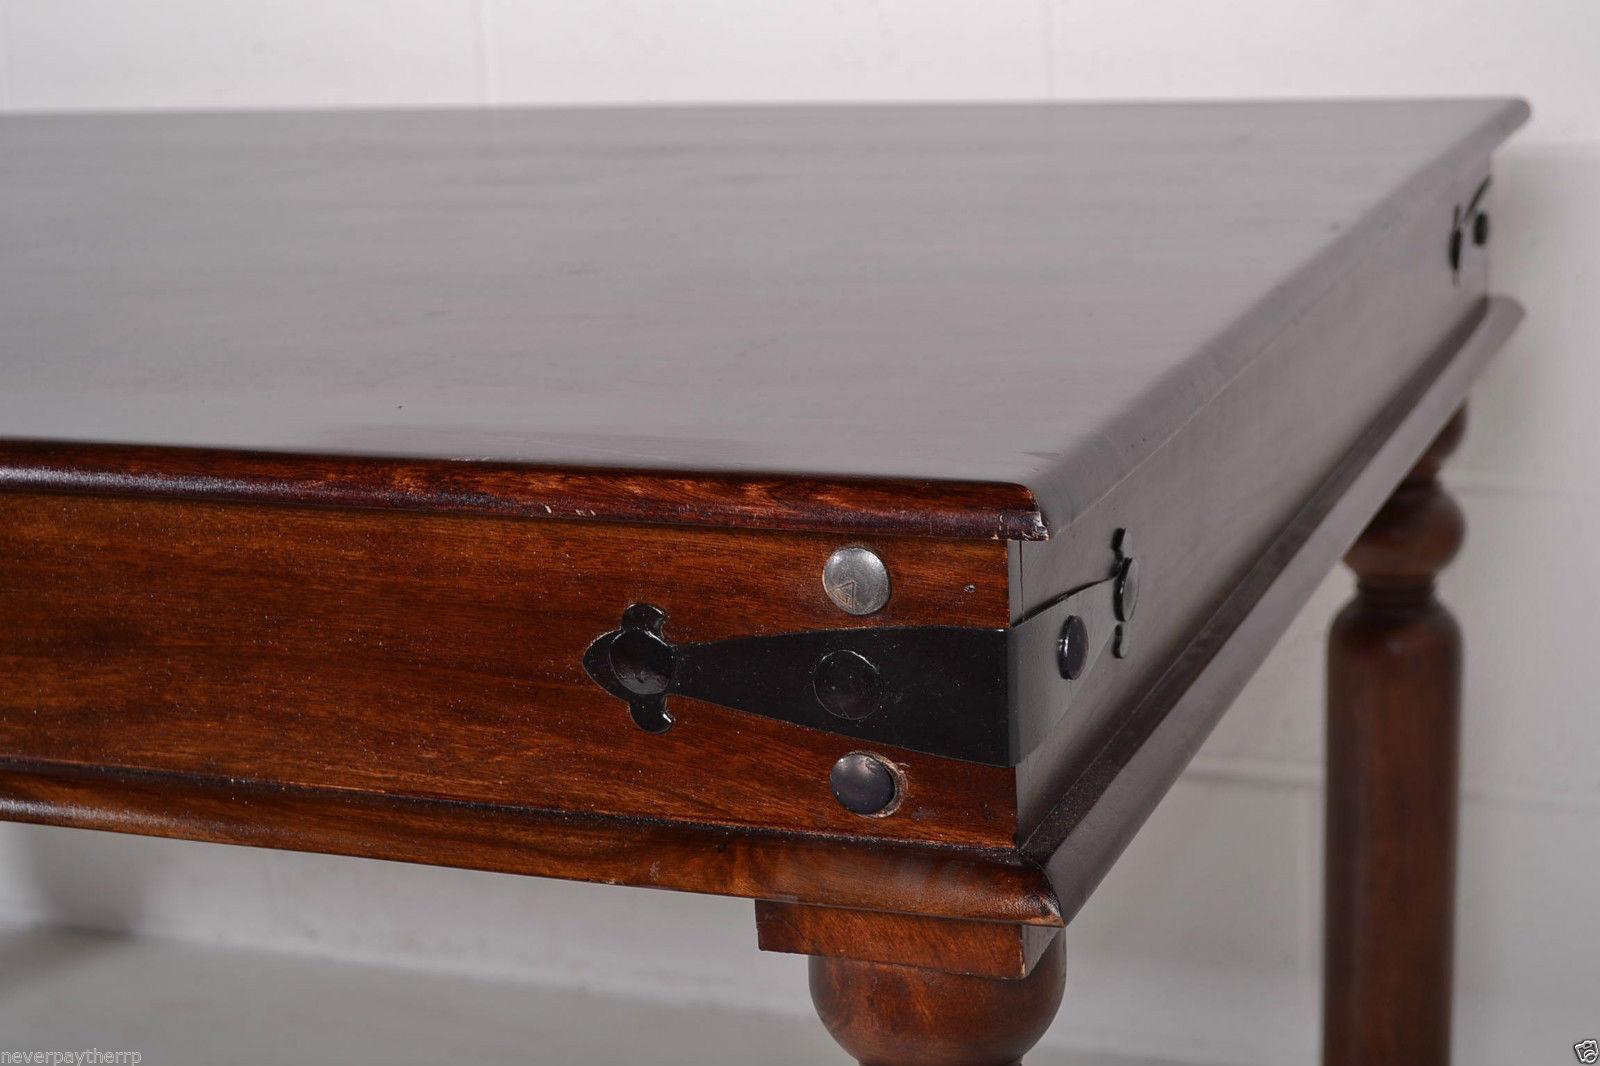 NEW JOHN LEWIS Maharani Dining Table amp 6 Chair Set 6  : original from www.bidspotter.co.uk size 1600 x 1066 jpeg 162kB